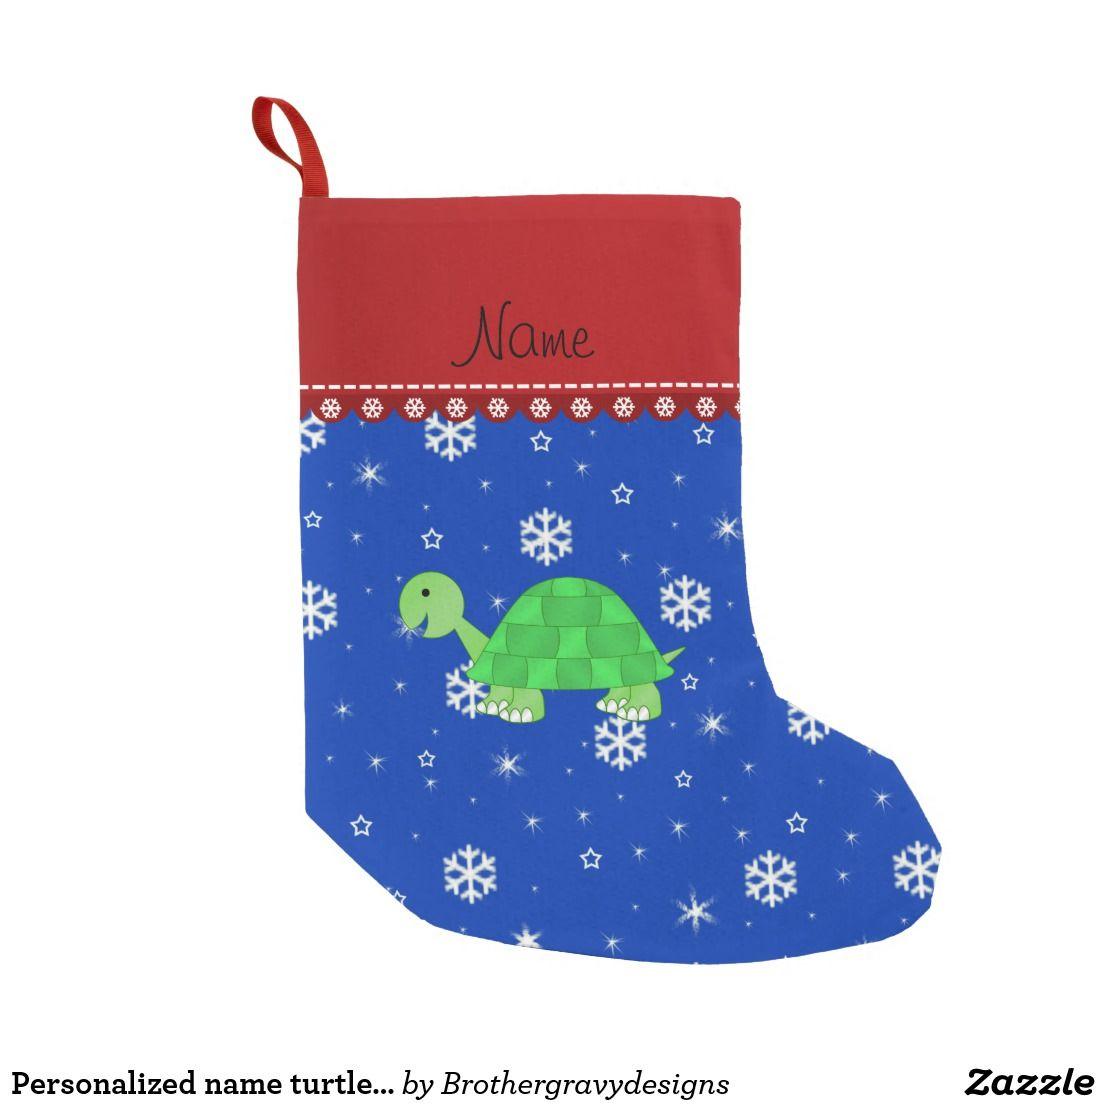 personalized name turtle blue snowflakes small christmas stocking